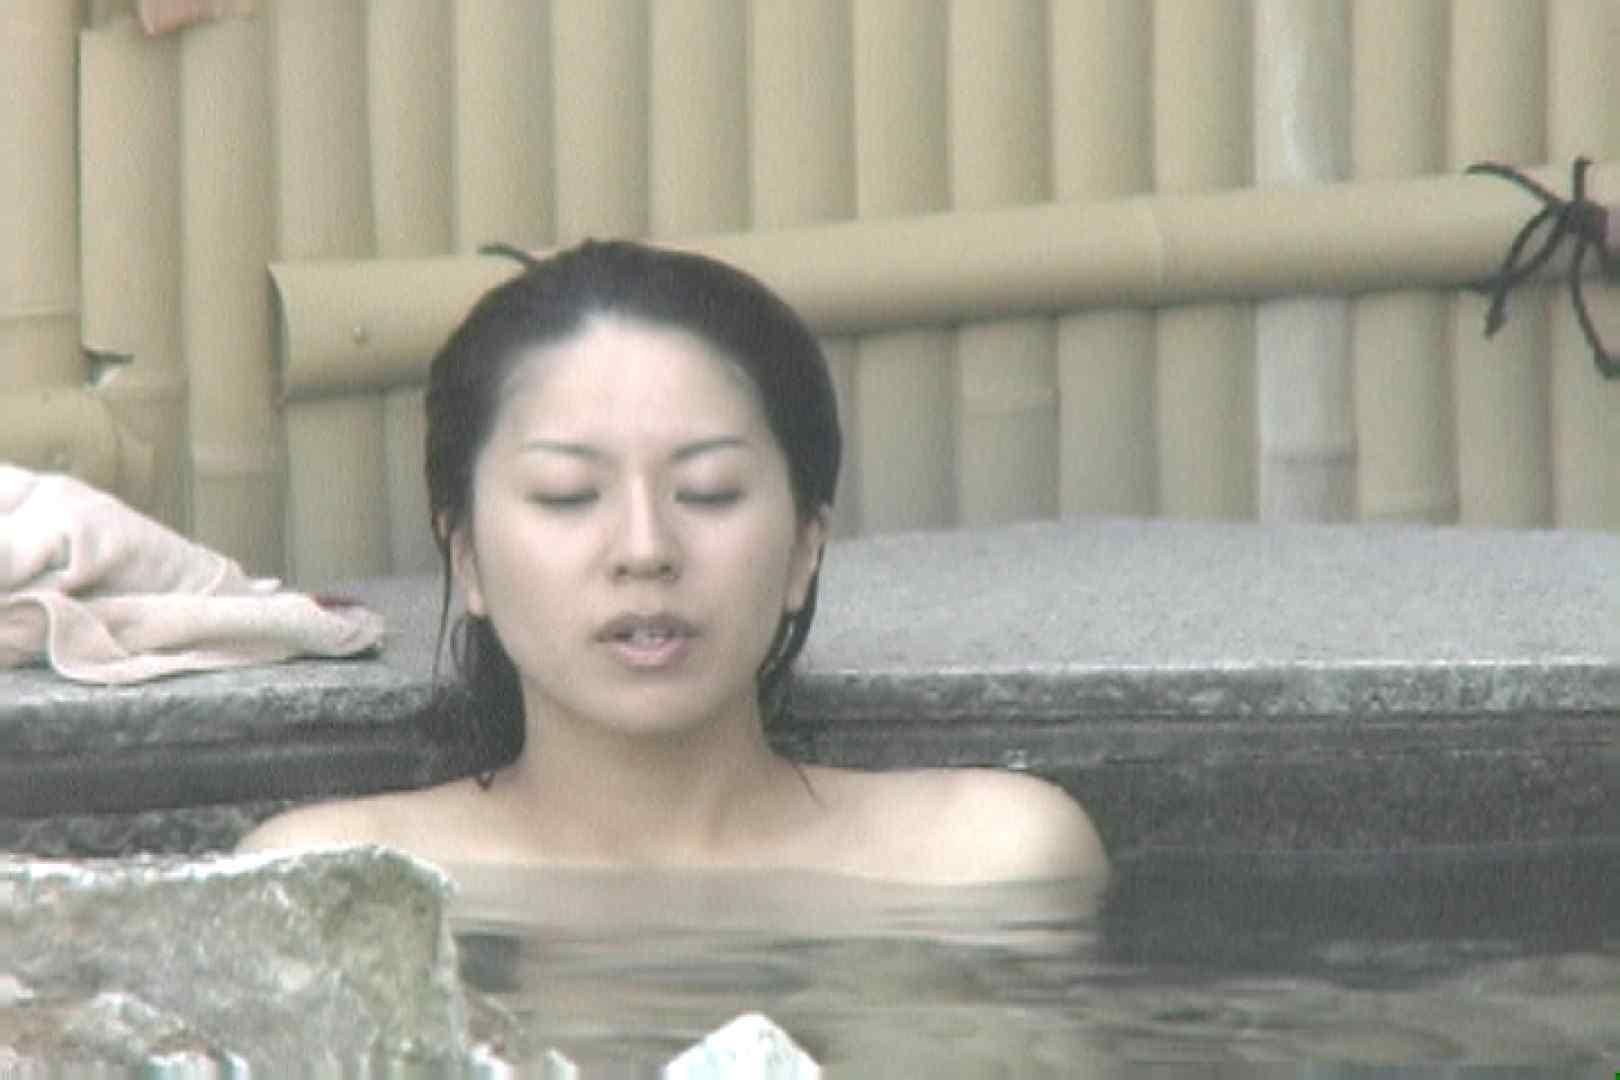 Aquaな露天風呂Vol.694 盗撮 | OLエロ画像  110PICs 34